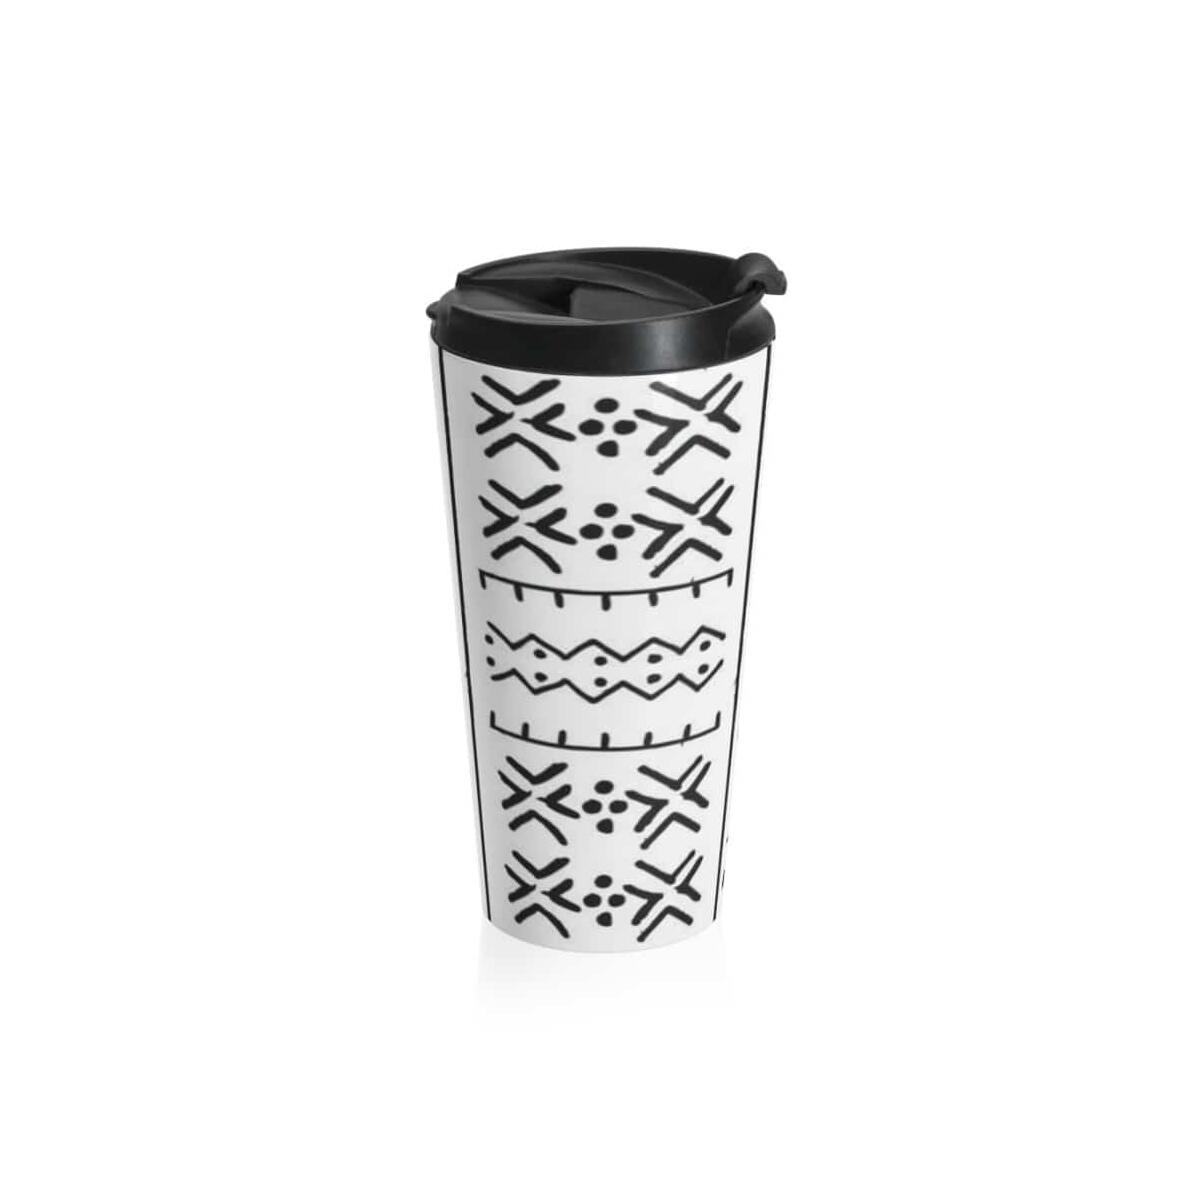 Black/White African Tribal Stainless Steel Travel Mug, Travel Mug